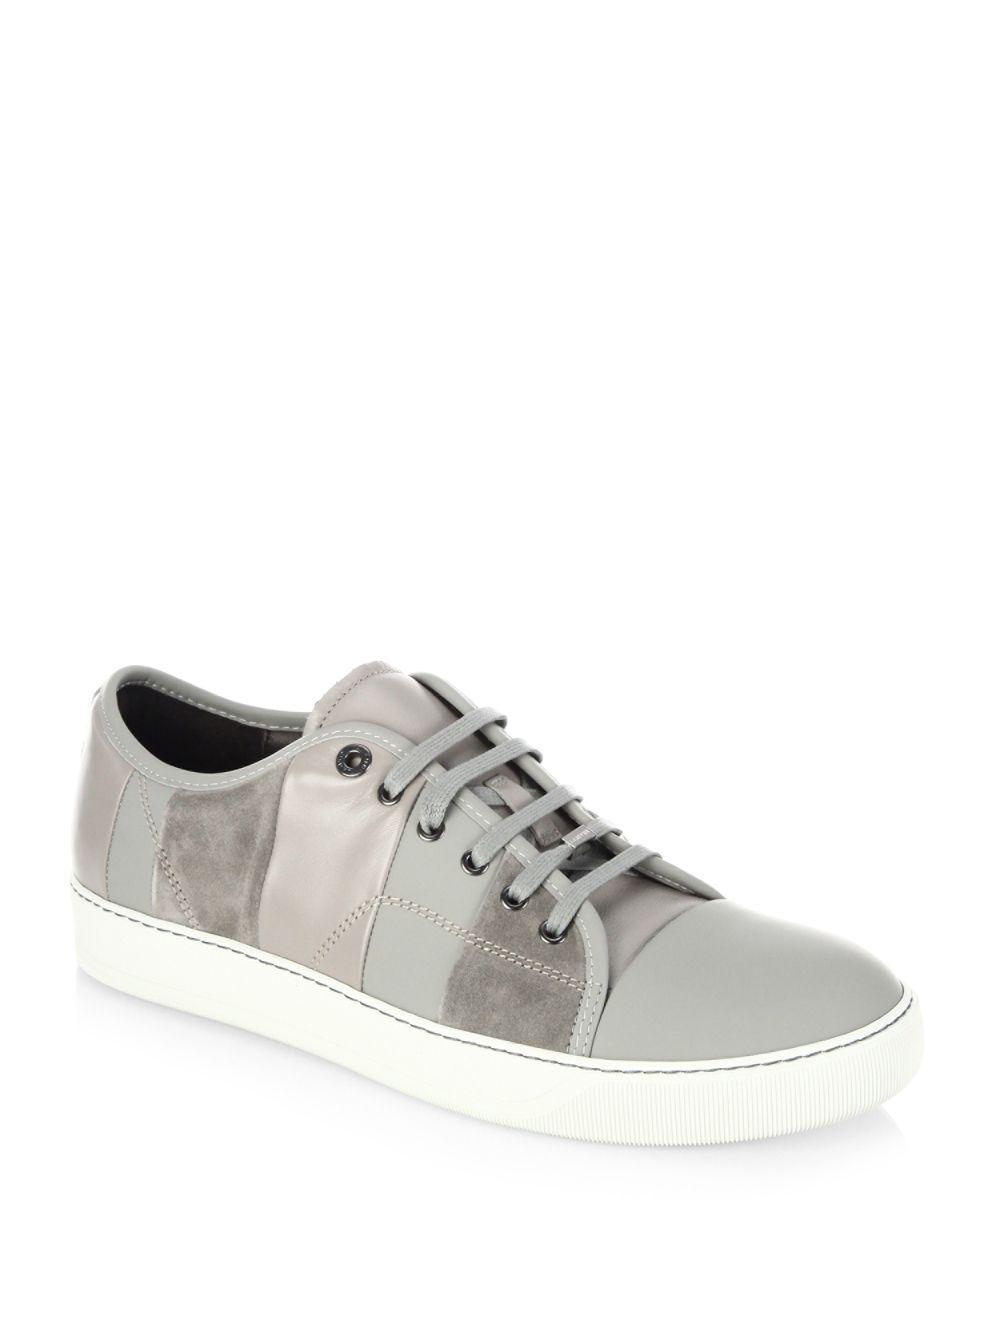 Lanvin. Men's Gray Multi-striped Leather Low-top Sneakers